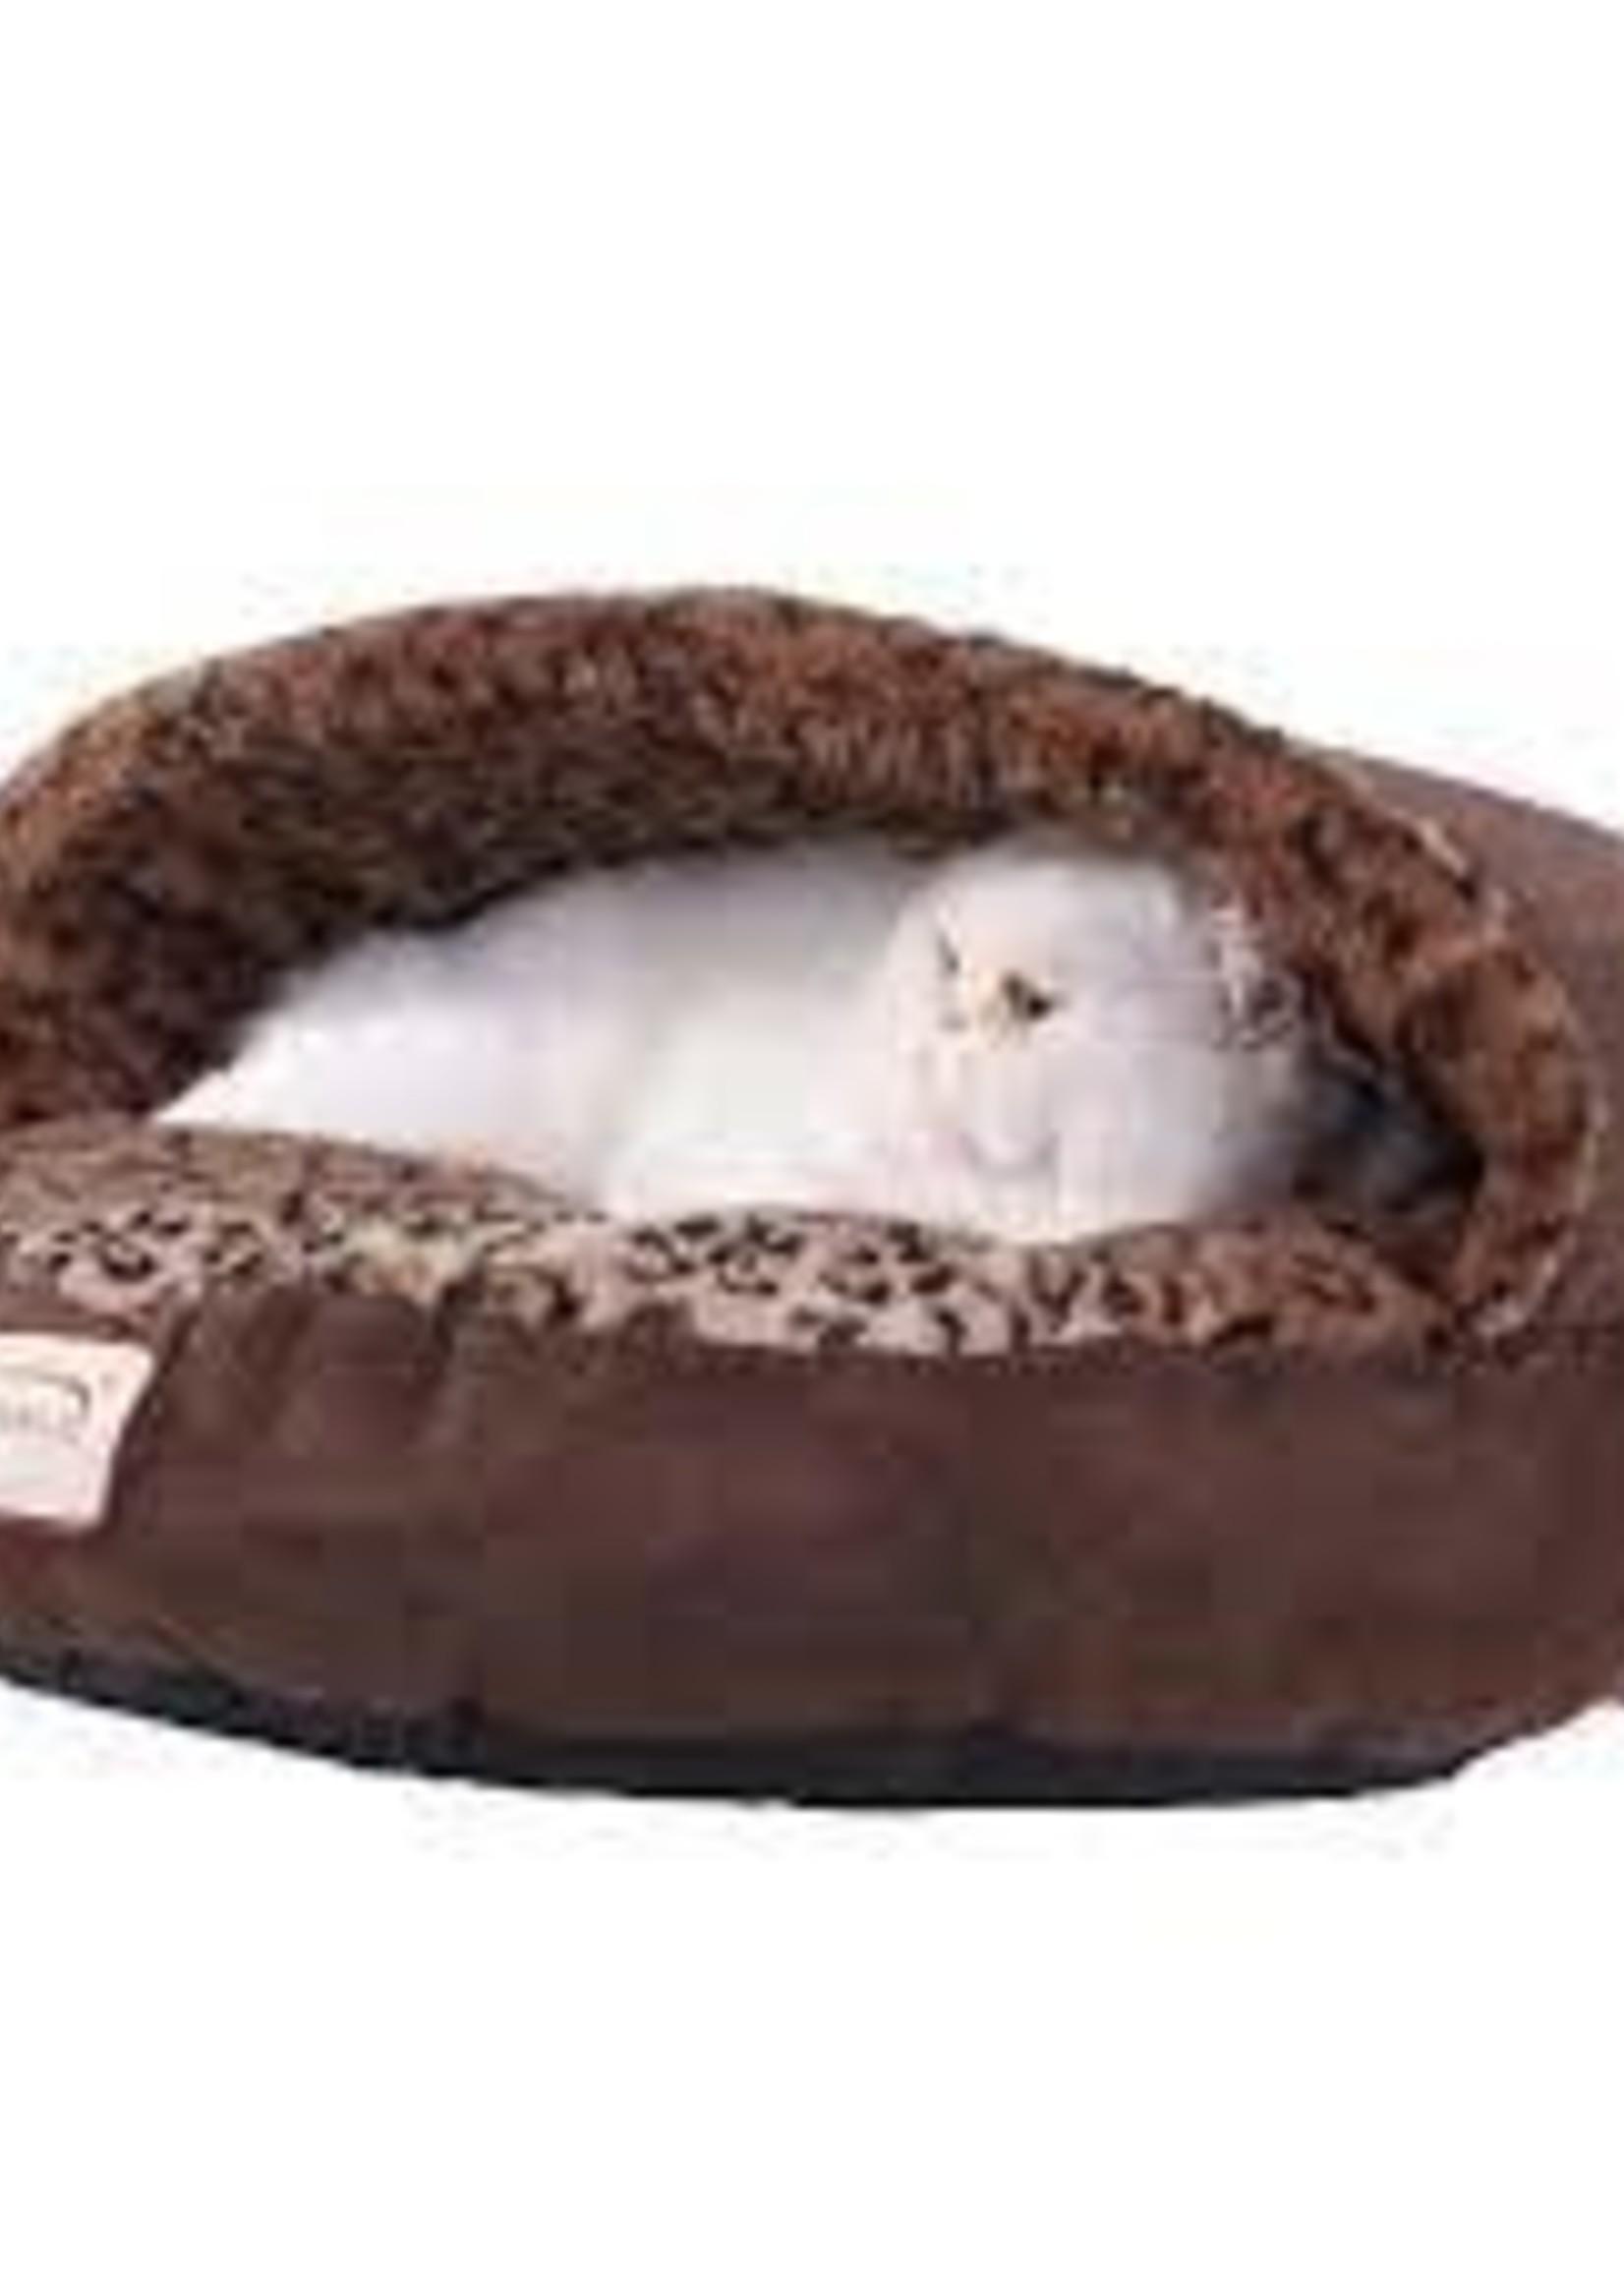 Armarkat Armarkat Cuddle Cave Cat Bed w/Anti-Slip Bottom Mocha/Leopard